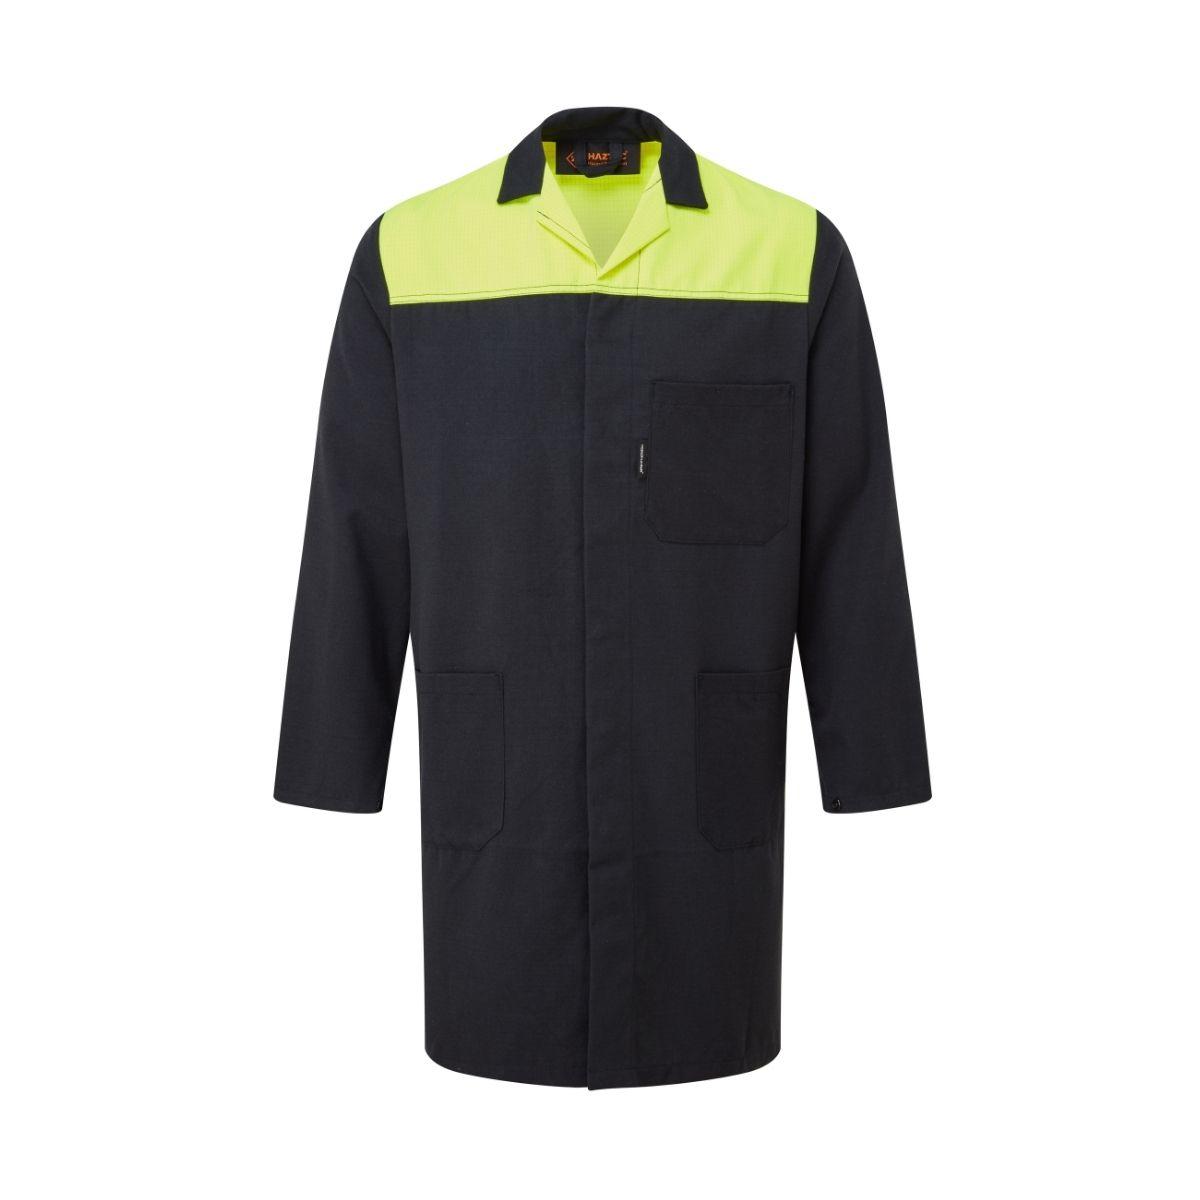 AS5895 HAZTEC® Triton FR AS Inherent Lab Coat